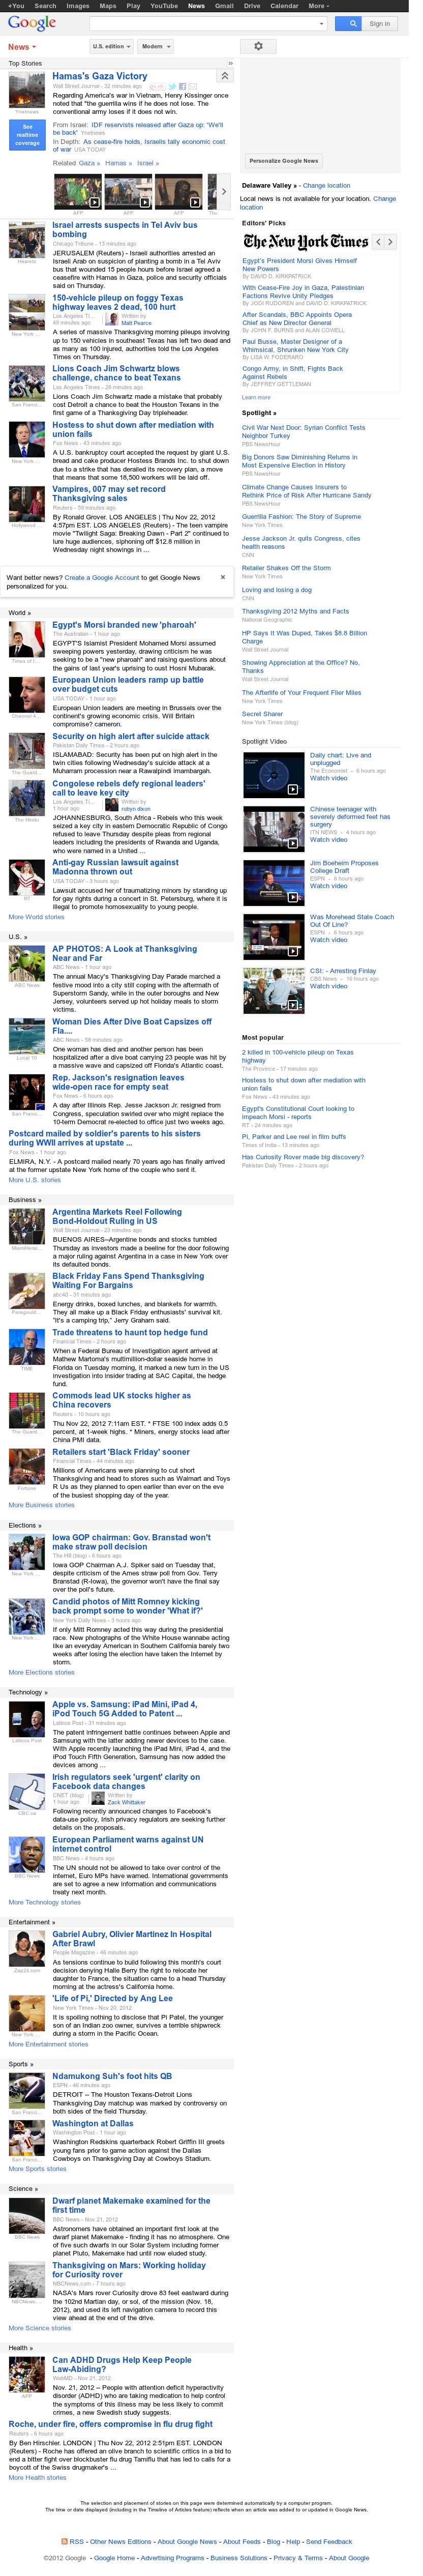 Google News at Thursday Nov. 22, 2012, 11:12 p.m. UTC